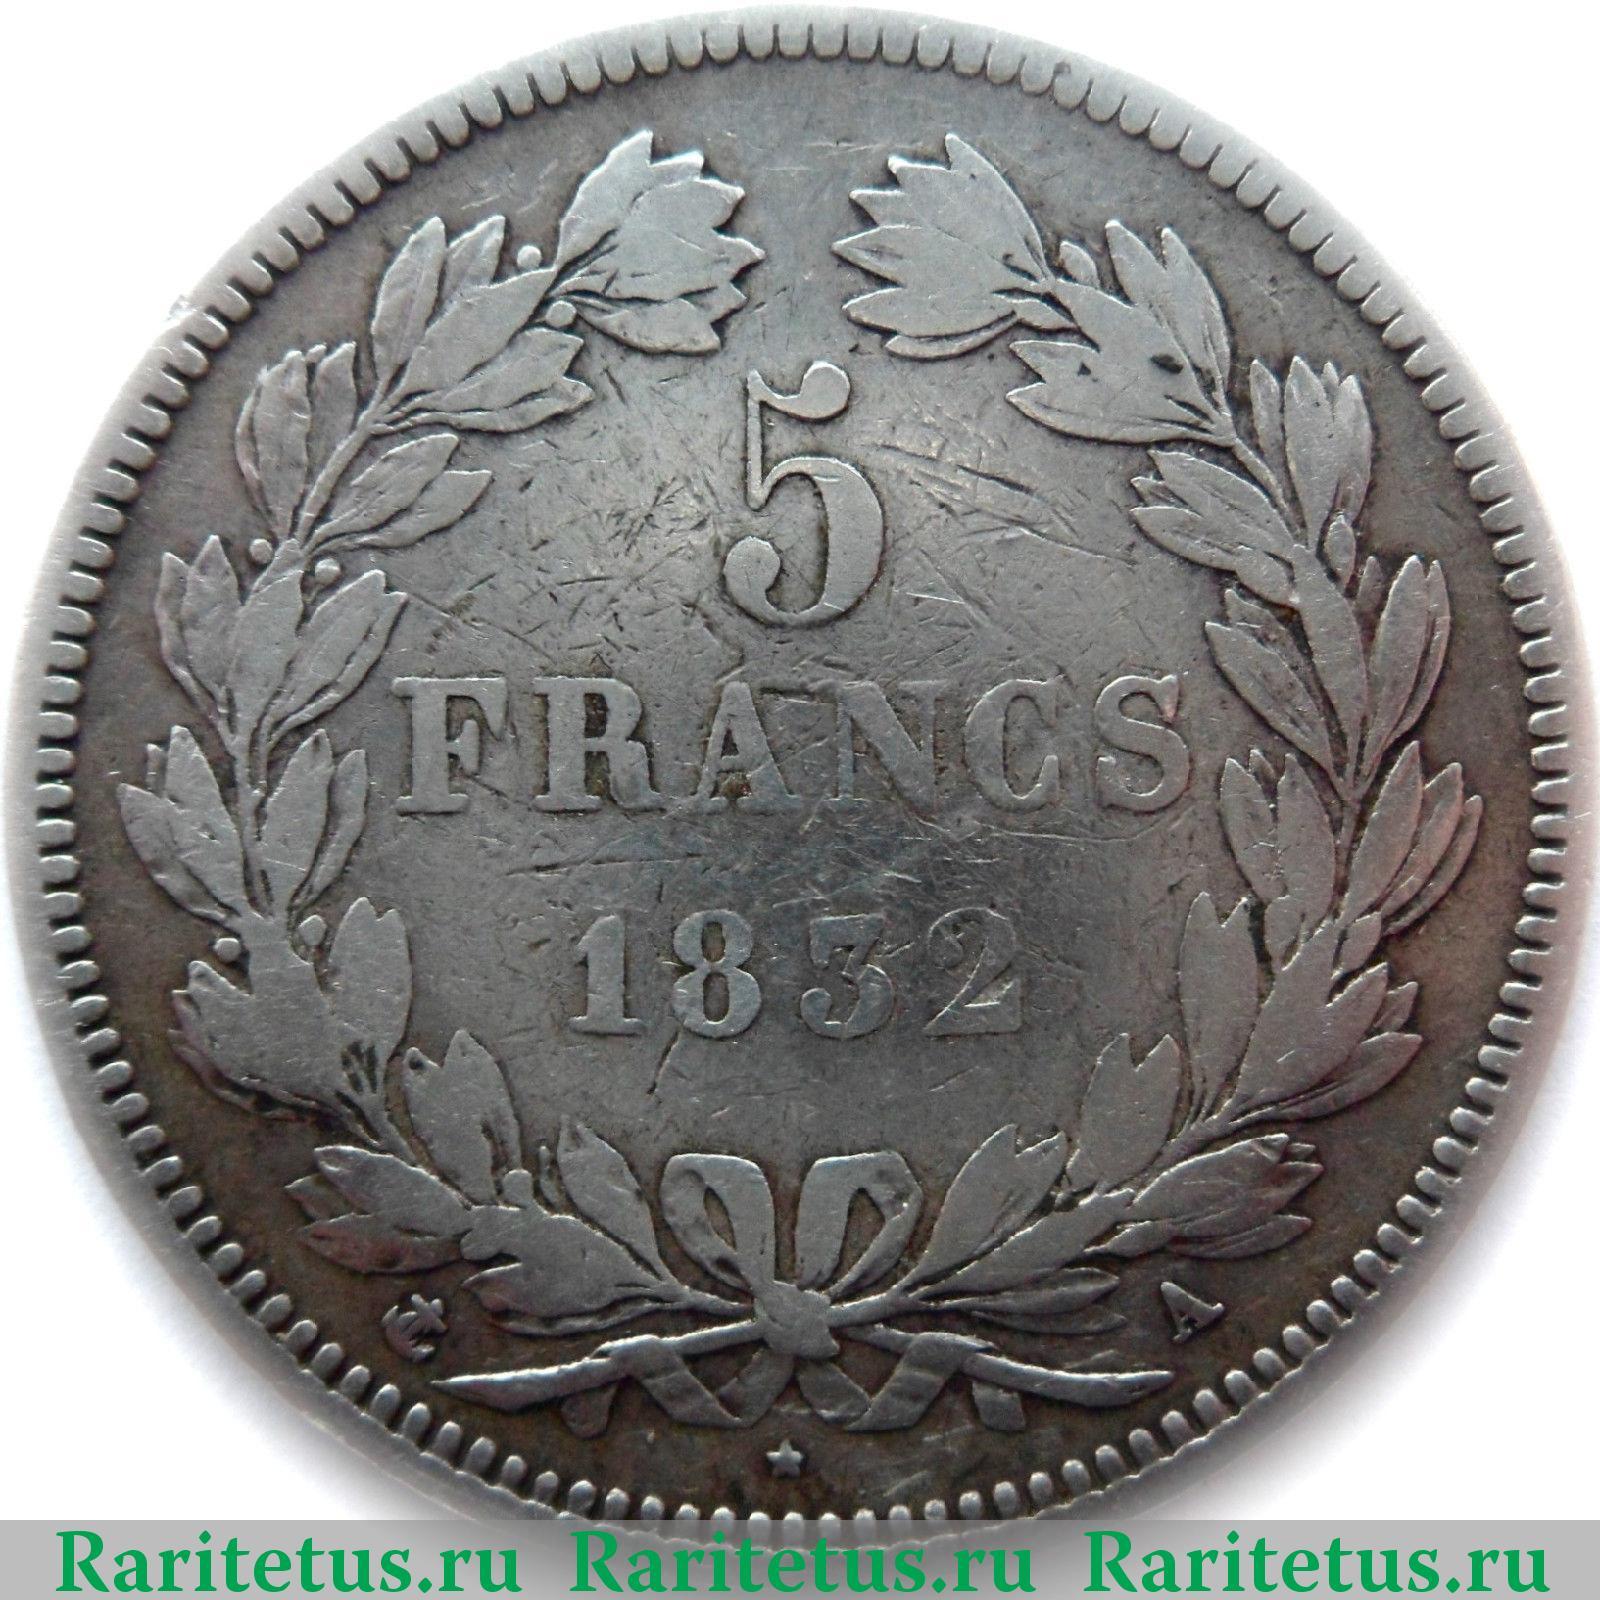 Цена монеты 5 франков 1832 года калужка деревня